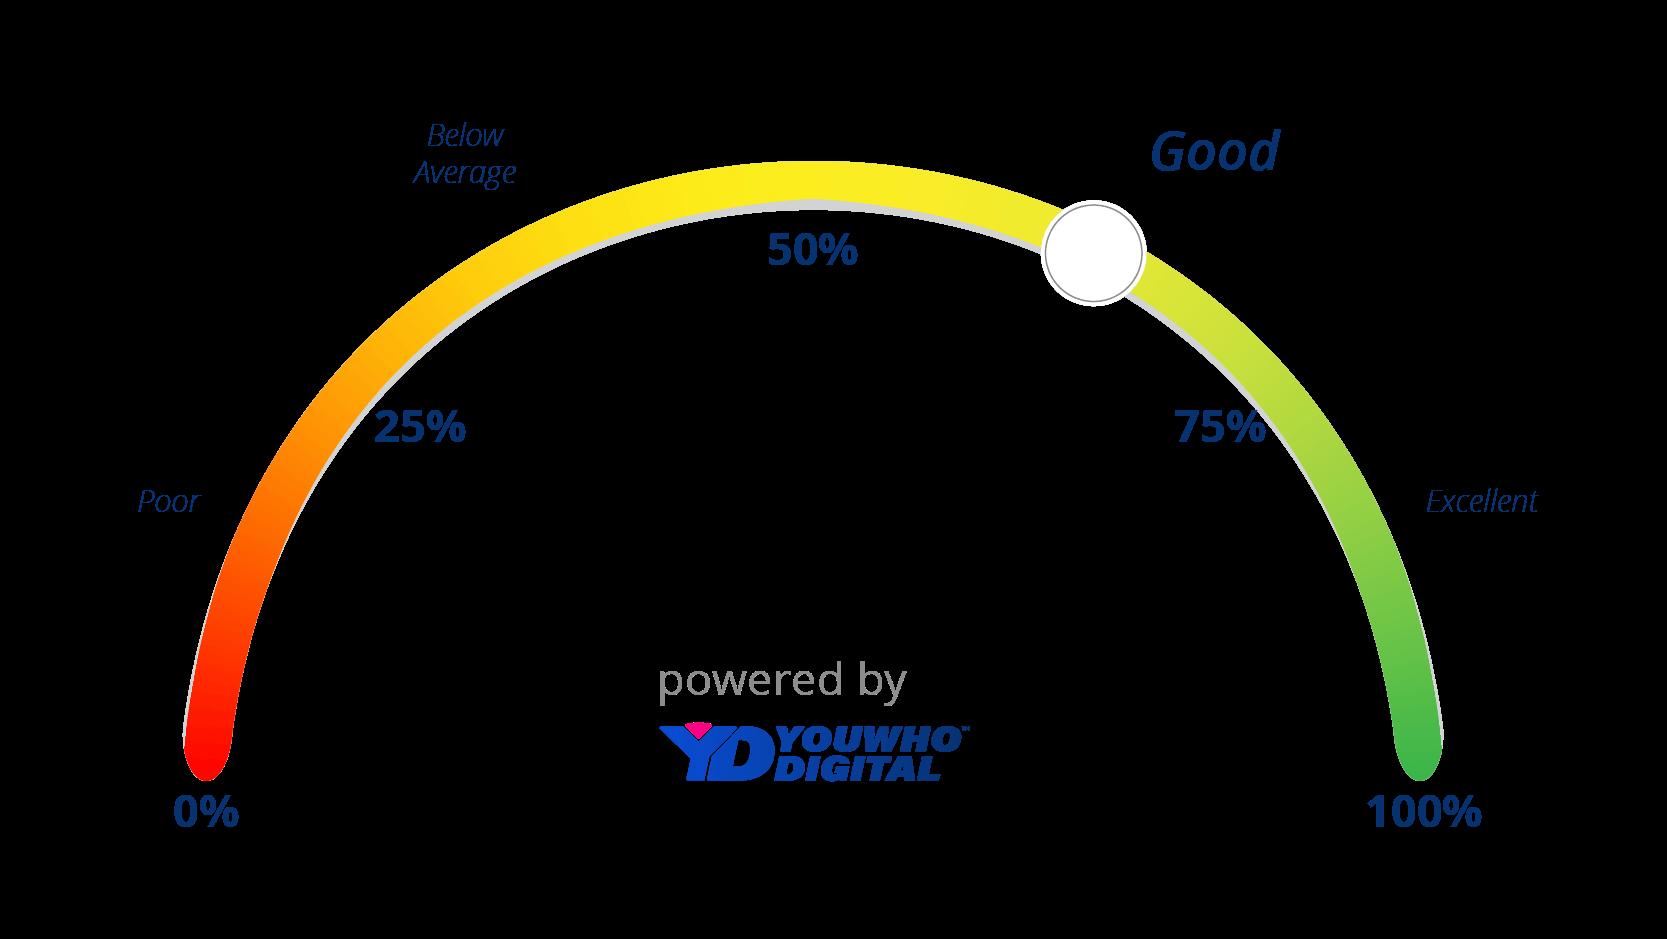 Good Digital Presence Score Indicator-03